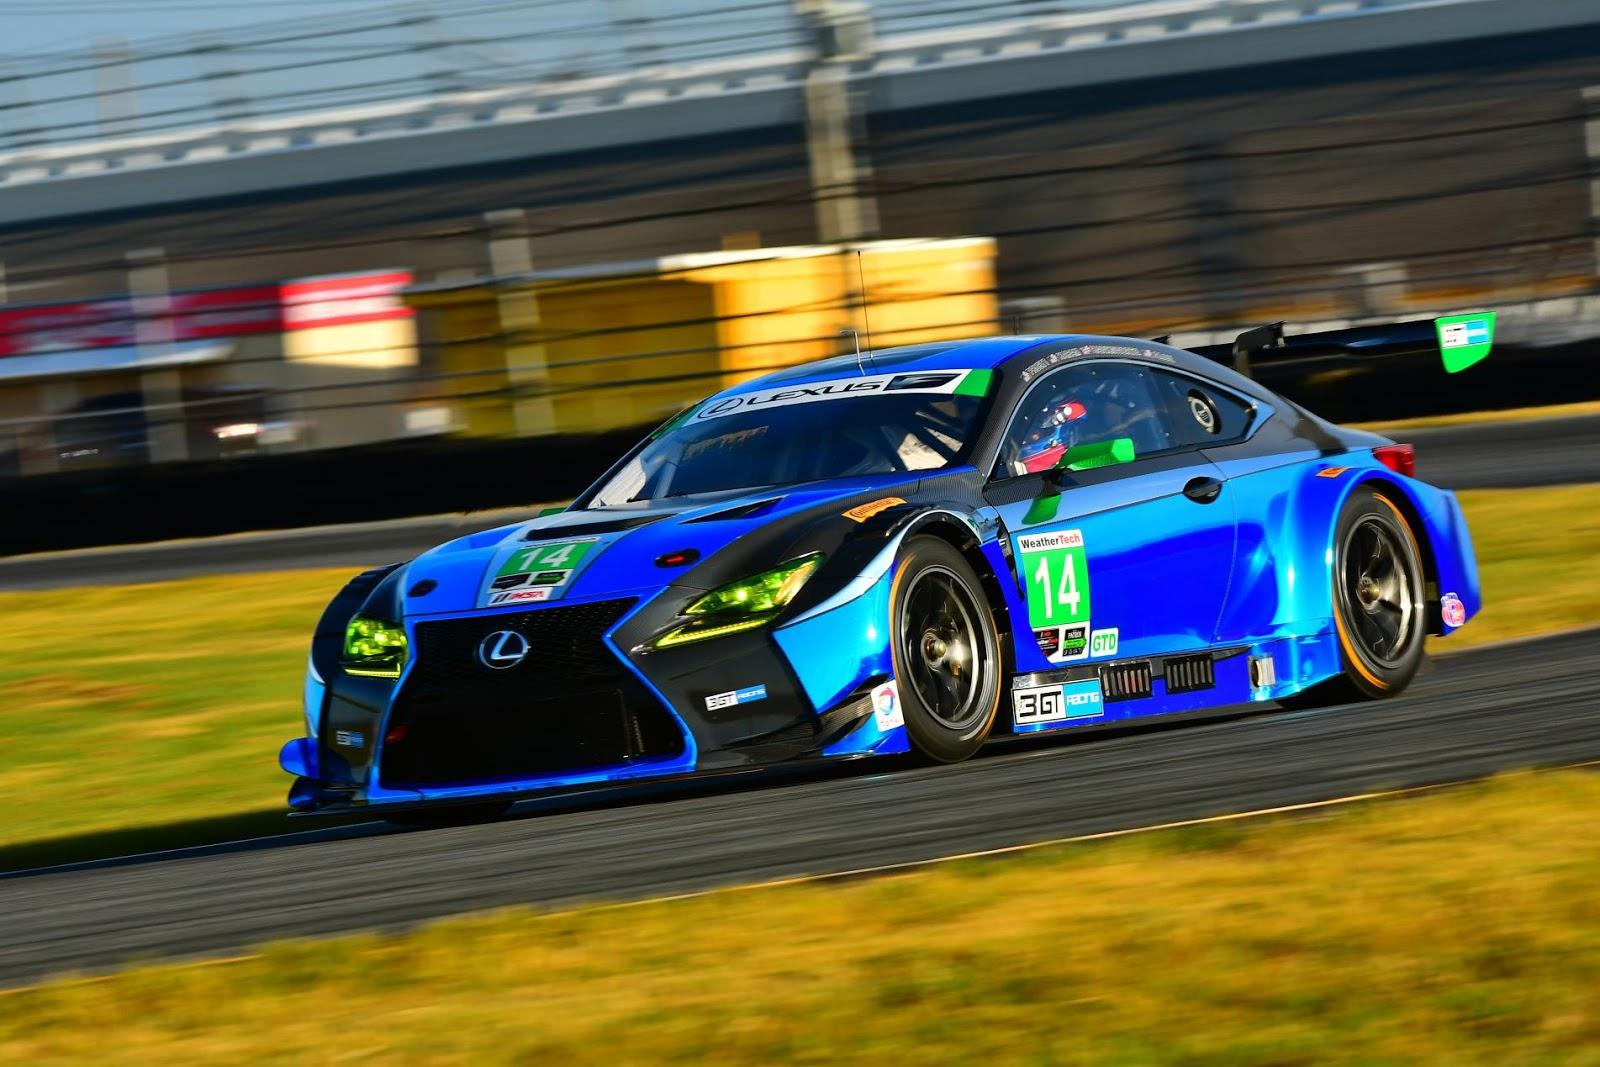 cars 54 lexus racing - photo #42